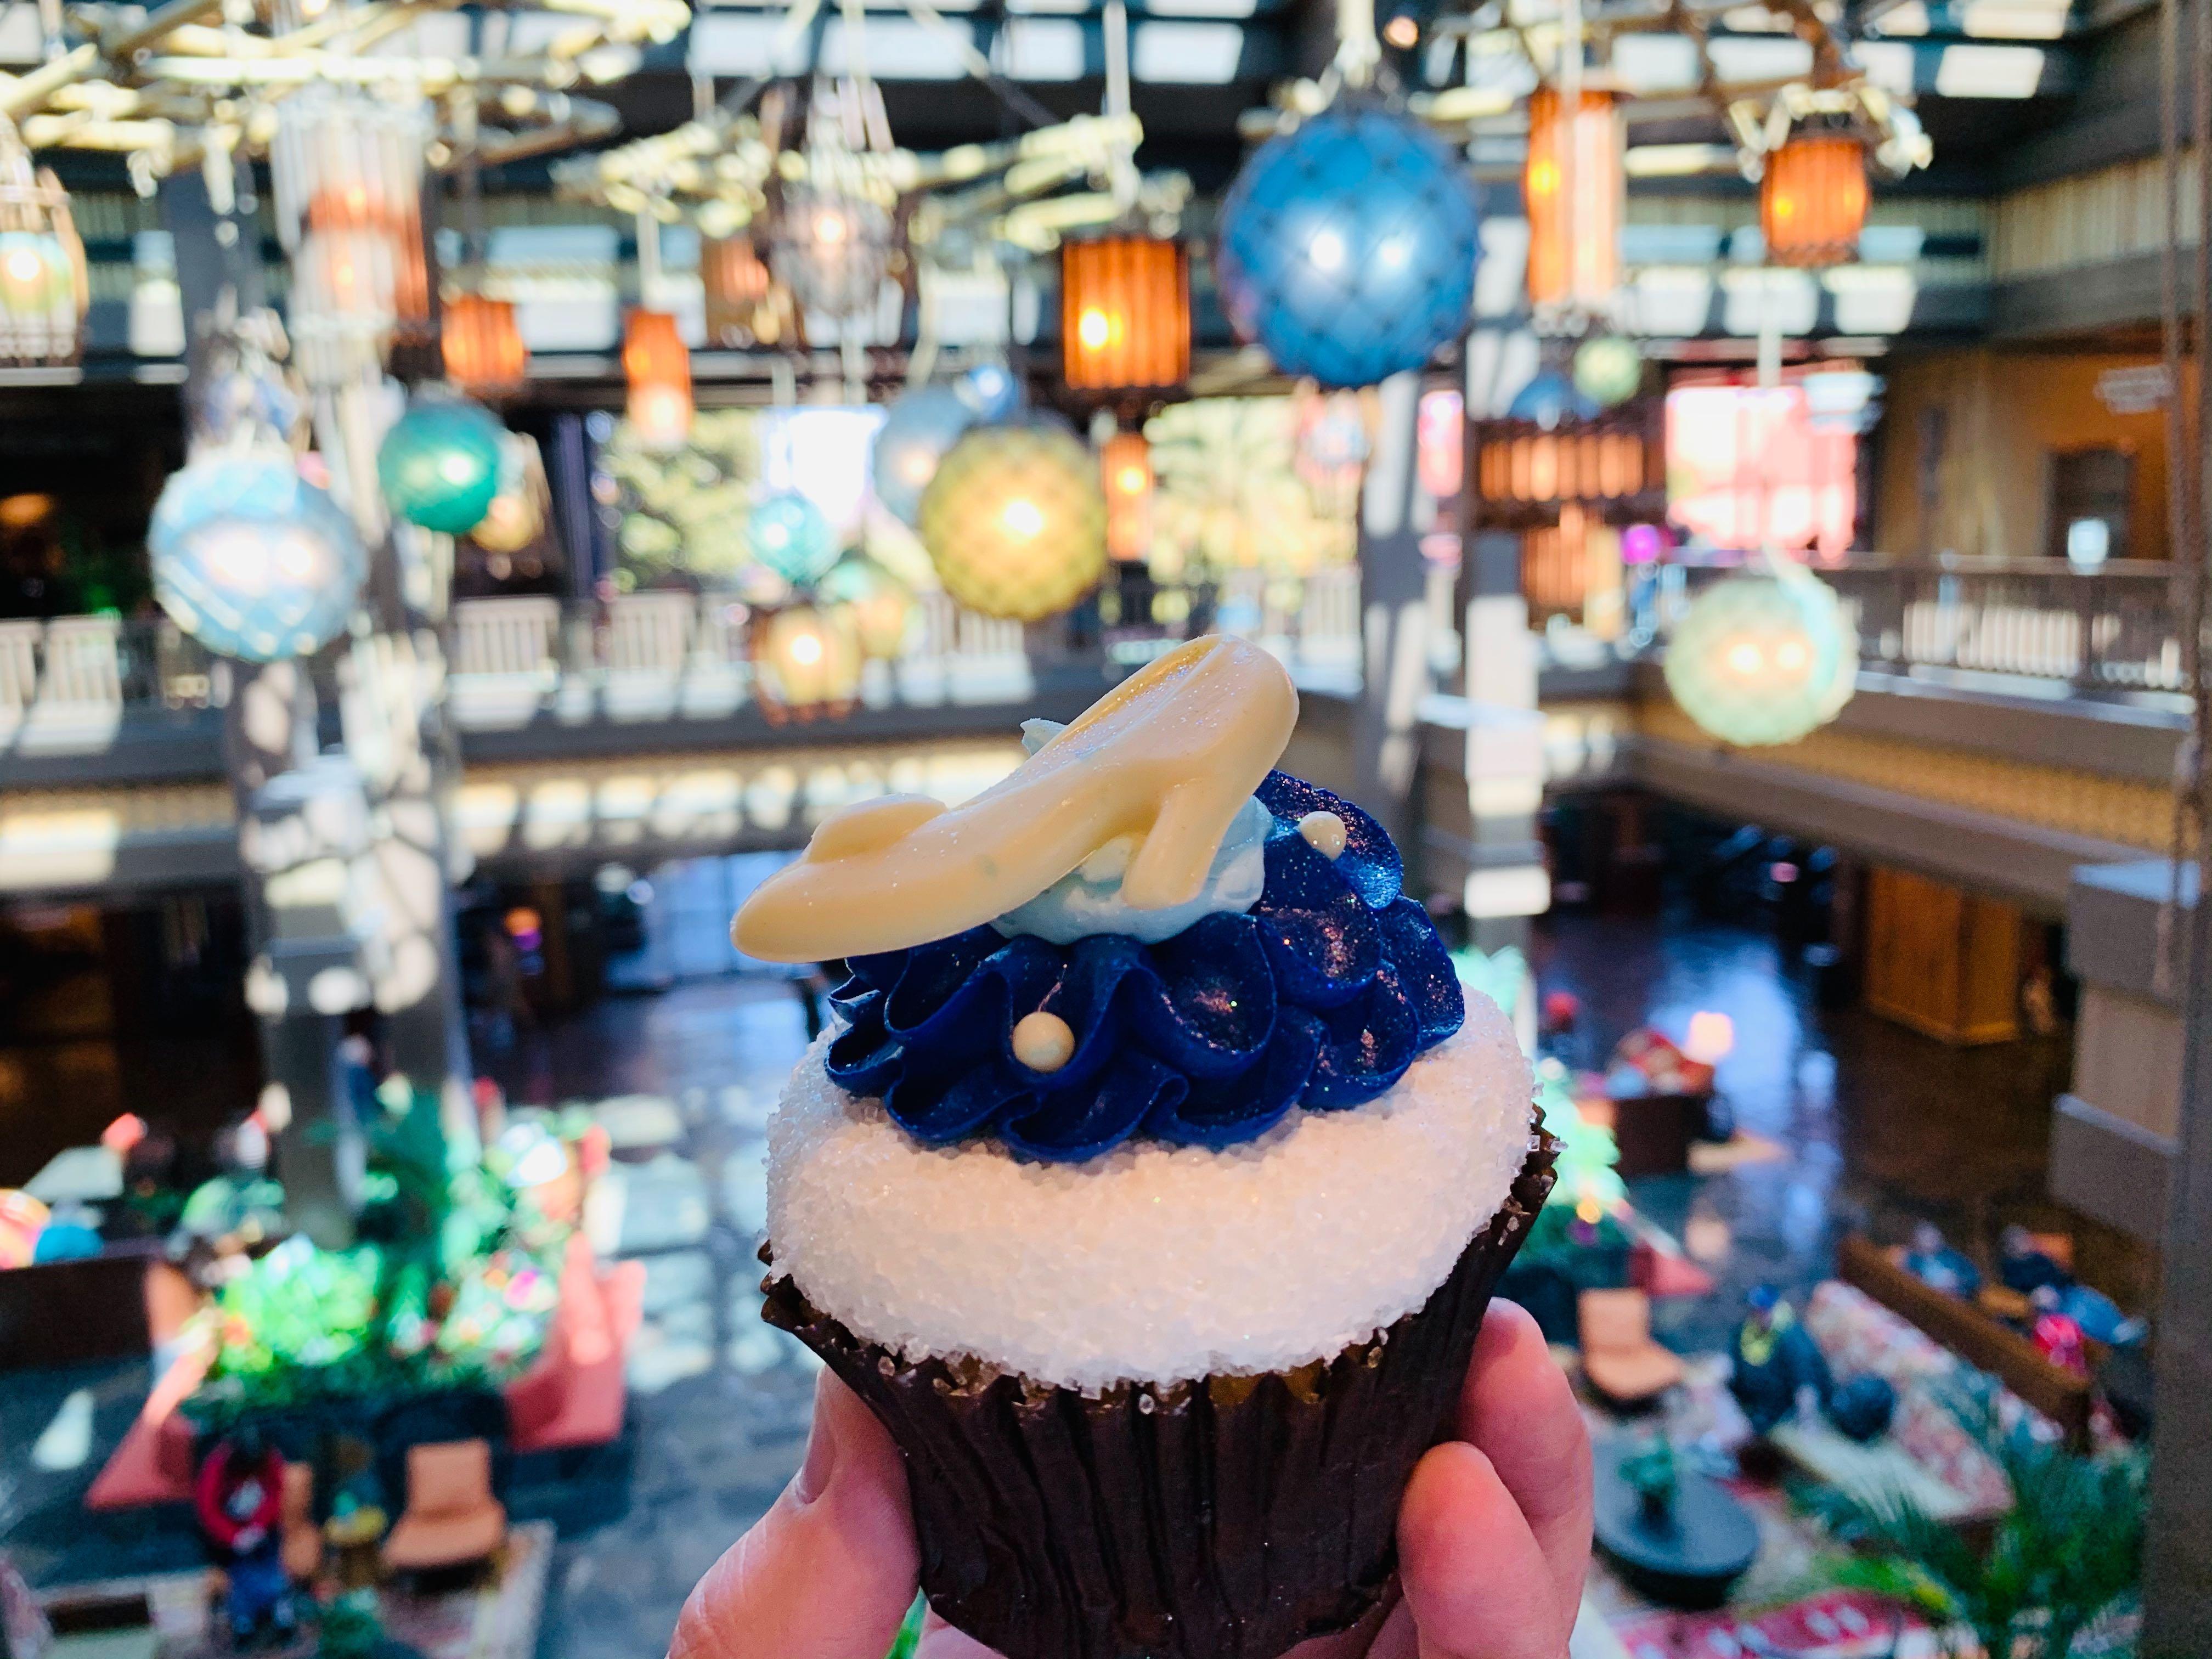 cinderella-cupcake-polynesian-poly-02-02-2020-4.jpg